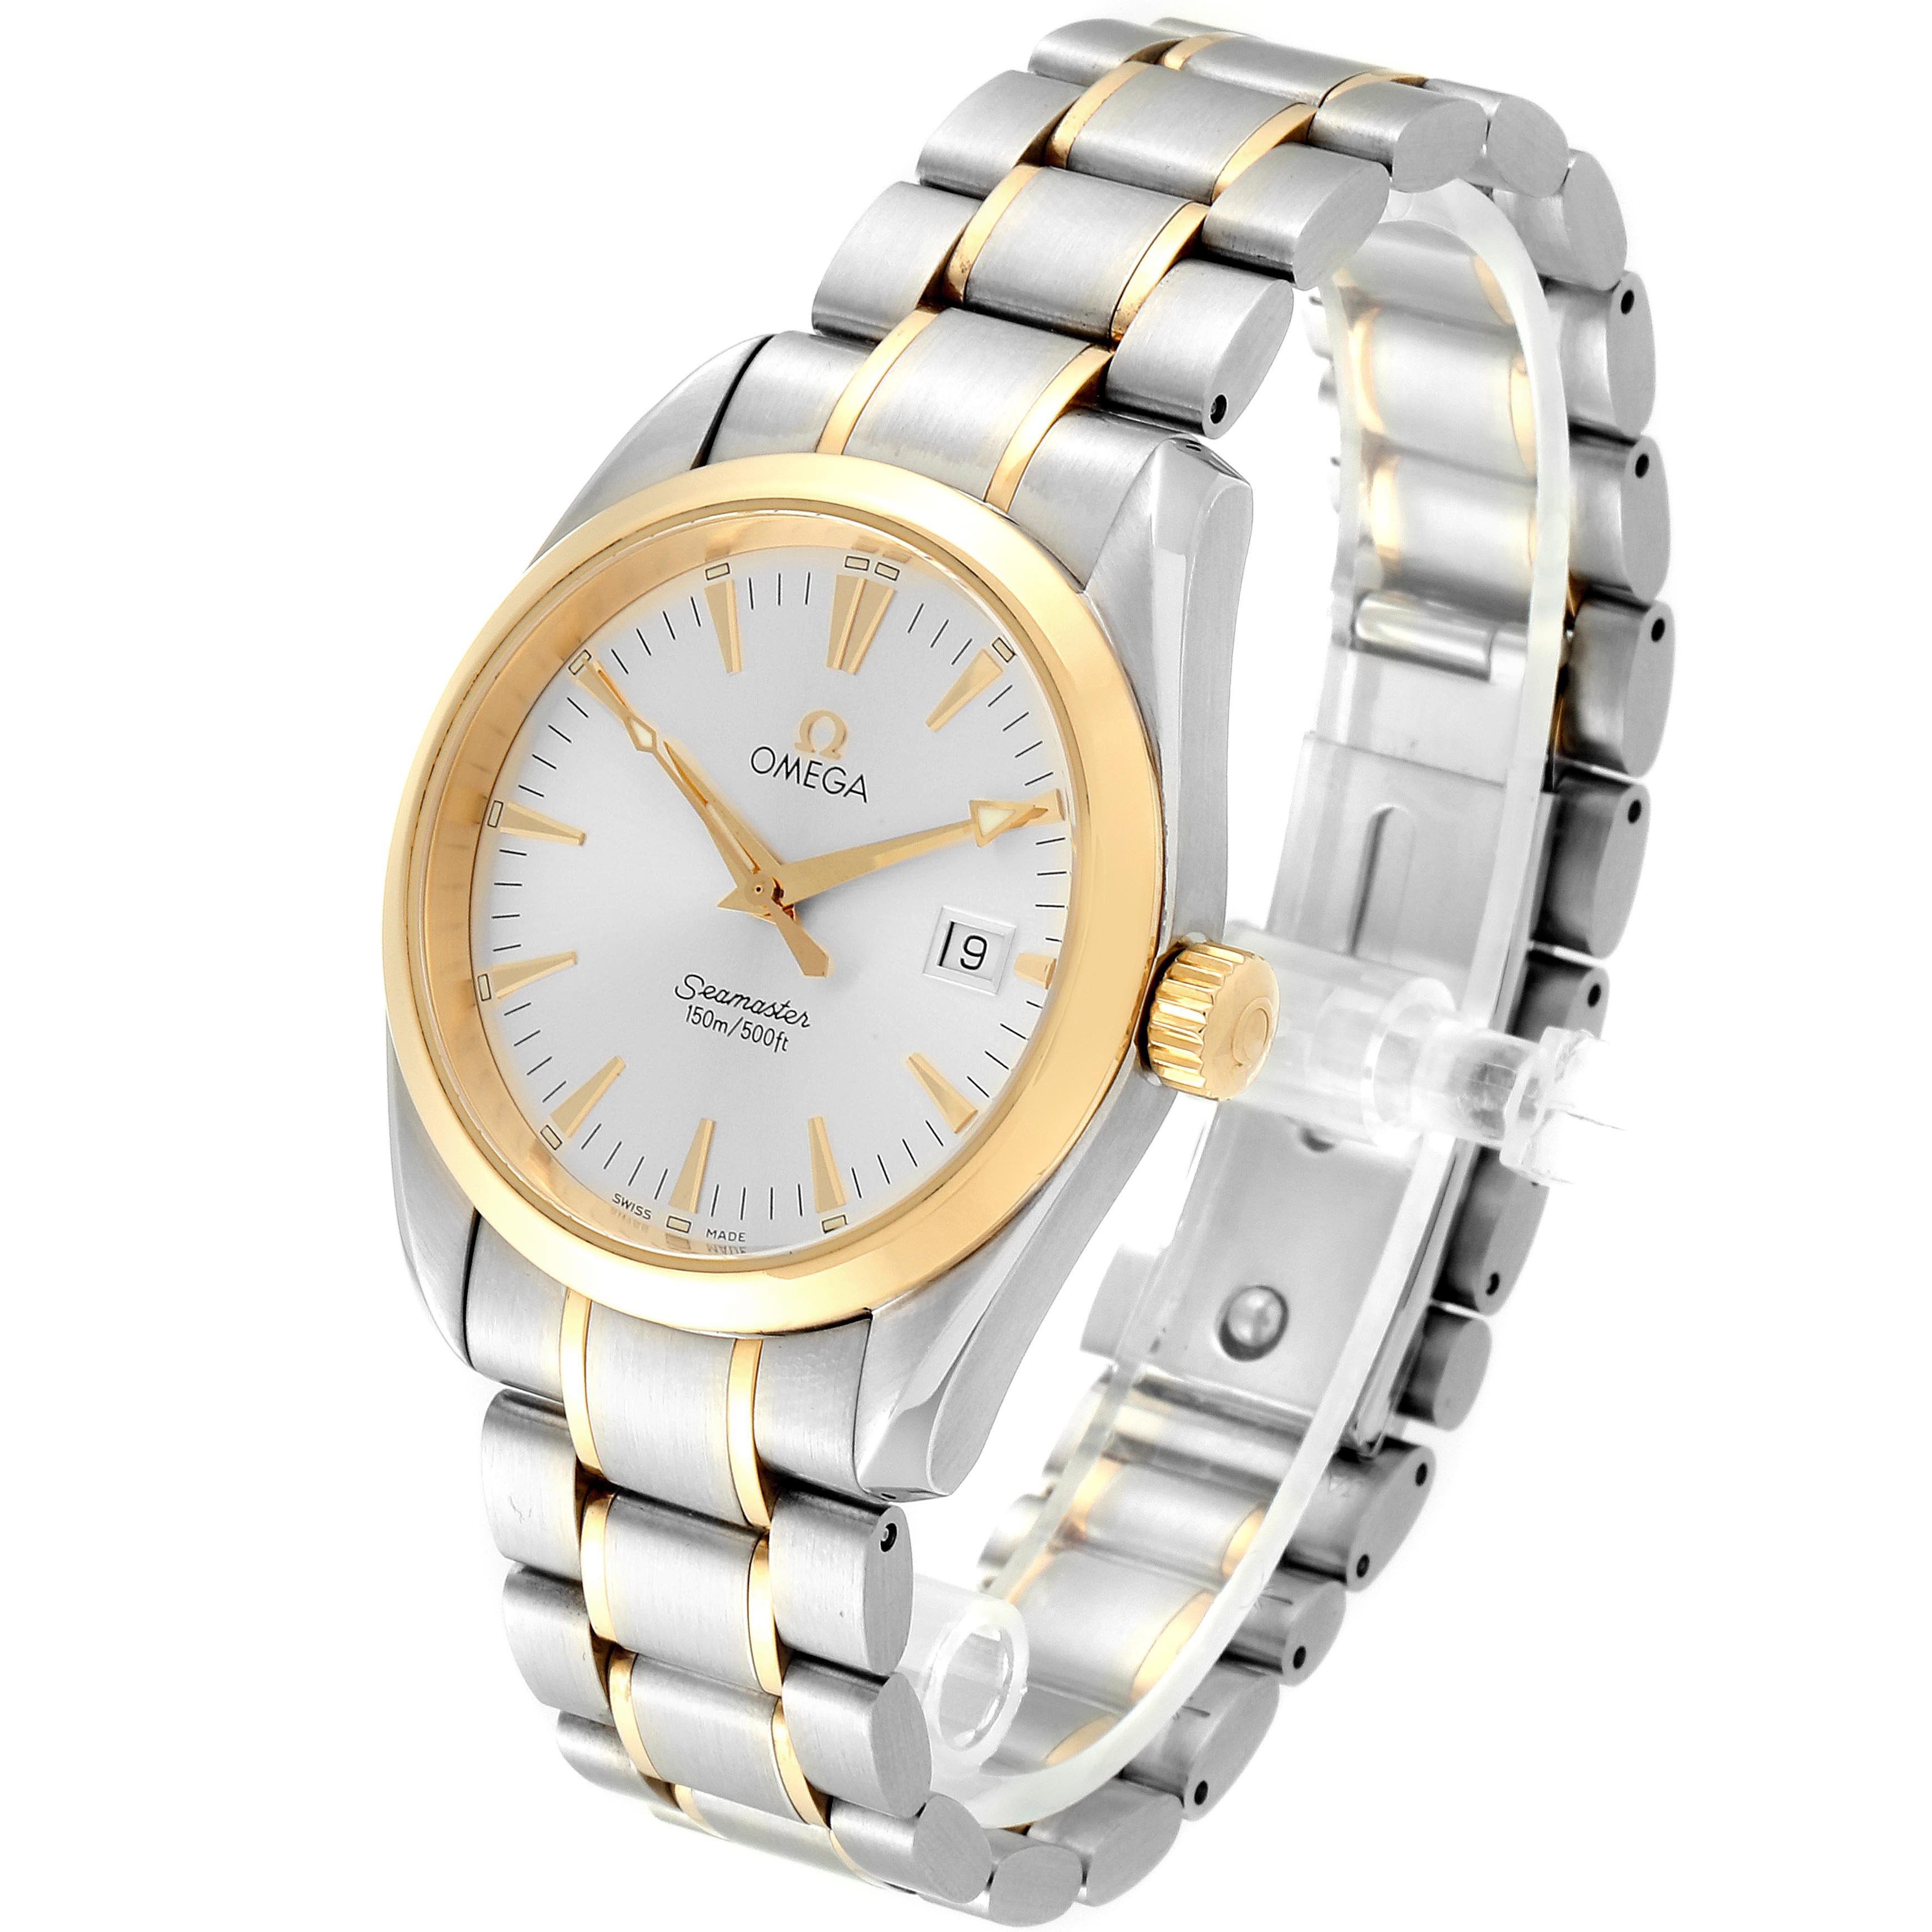 Omega Seamaster Aqua Terra 150M Steel Yellow Gold Watch 2317.30.00 SwissWatchExpo